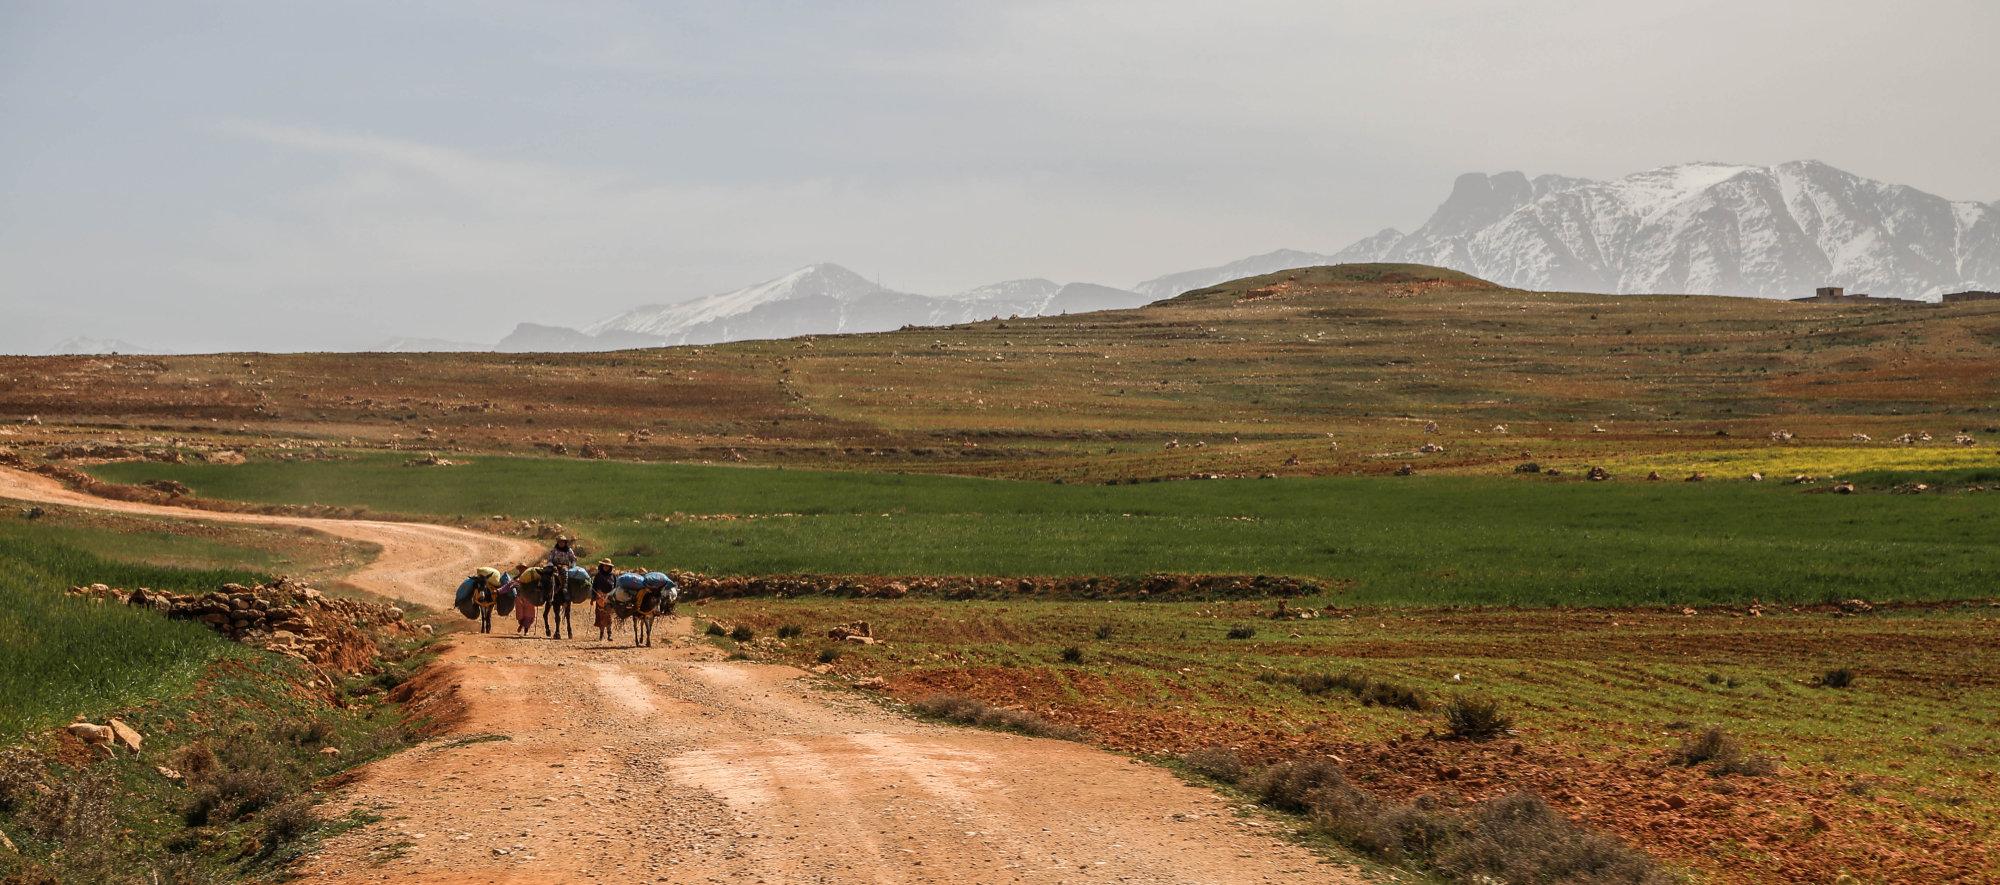 Mule Train Atlas Mountains Morocco